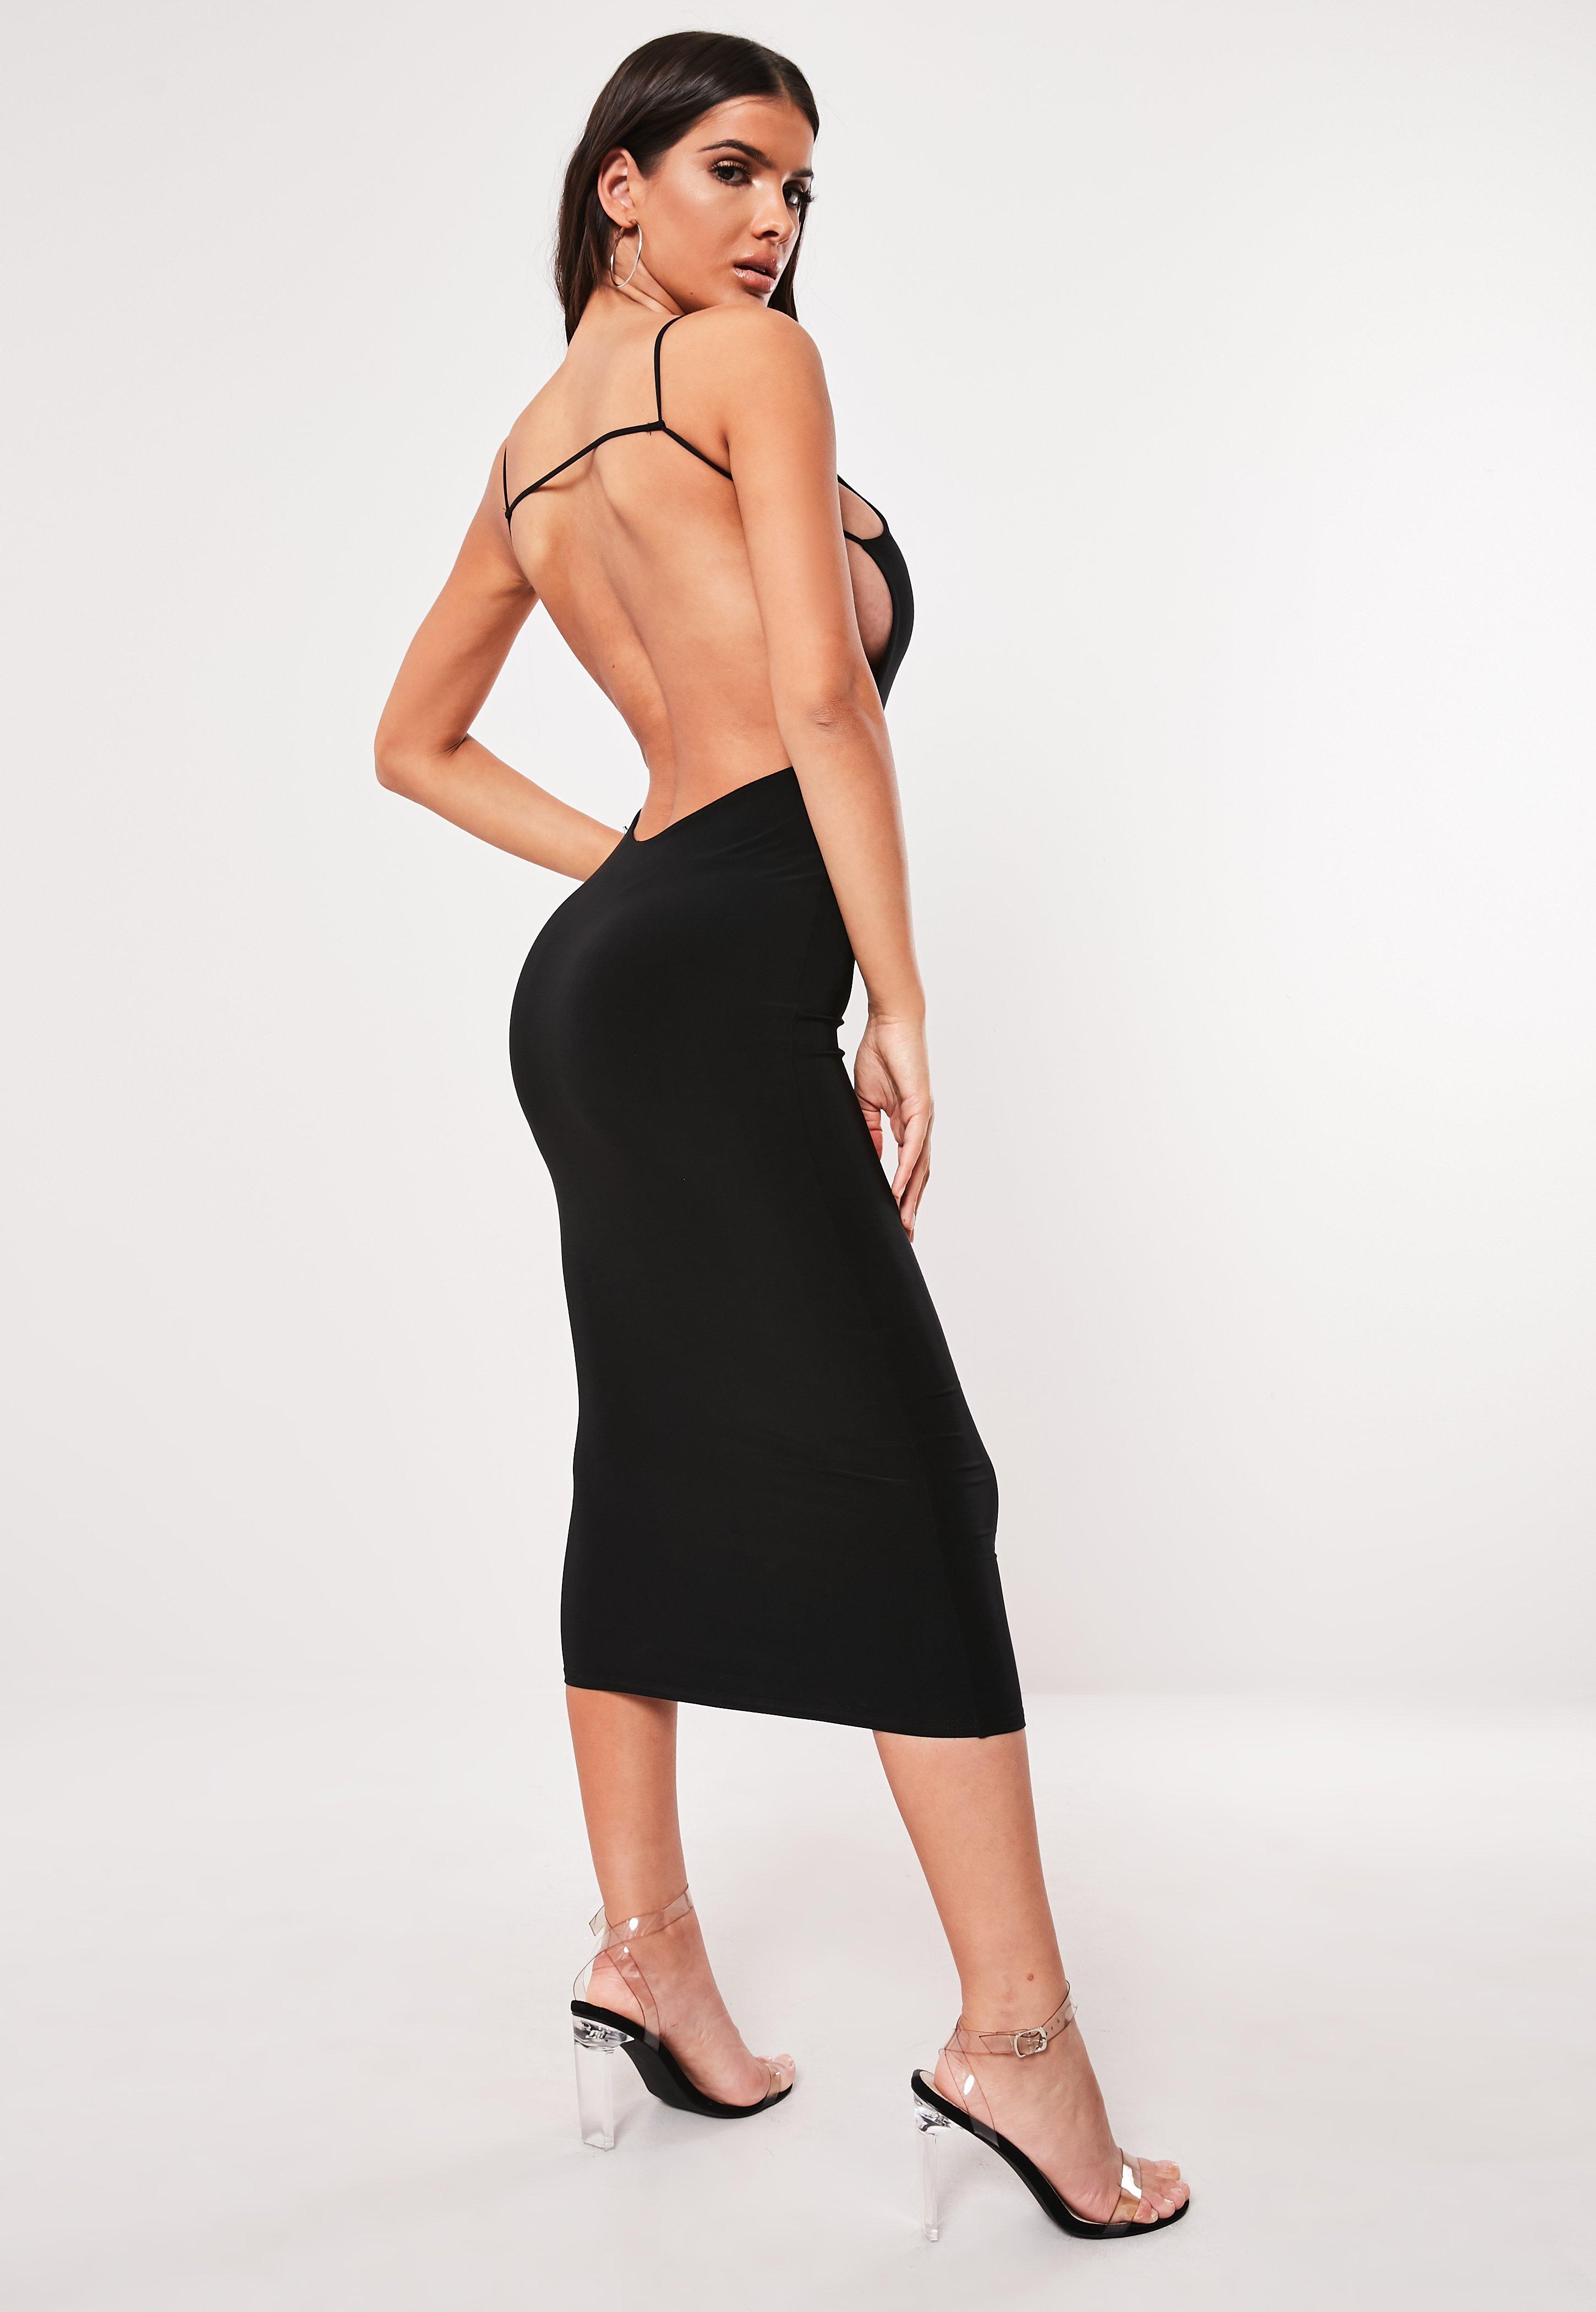 cd0573bcbf2c Backless Dresses